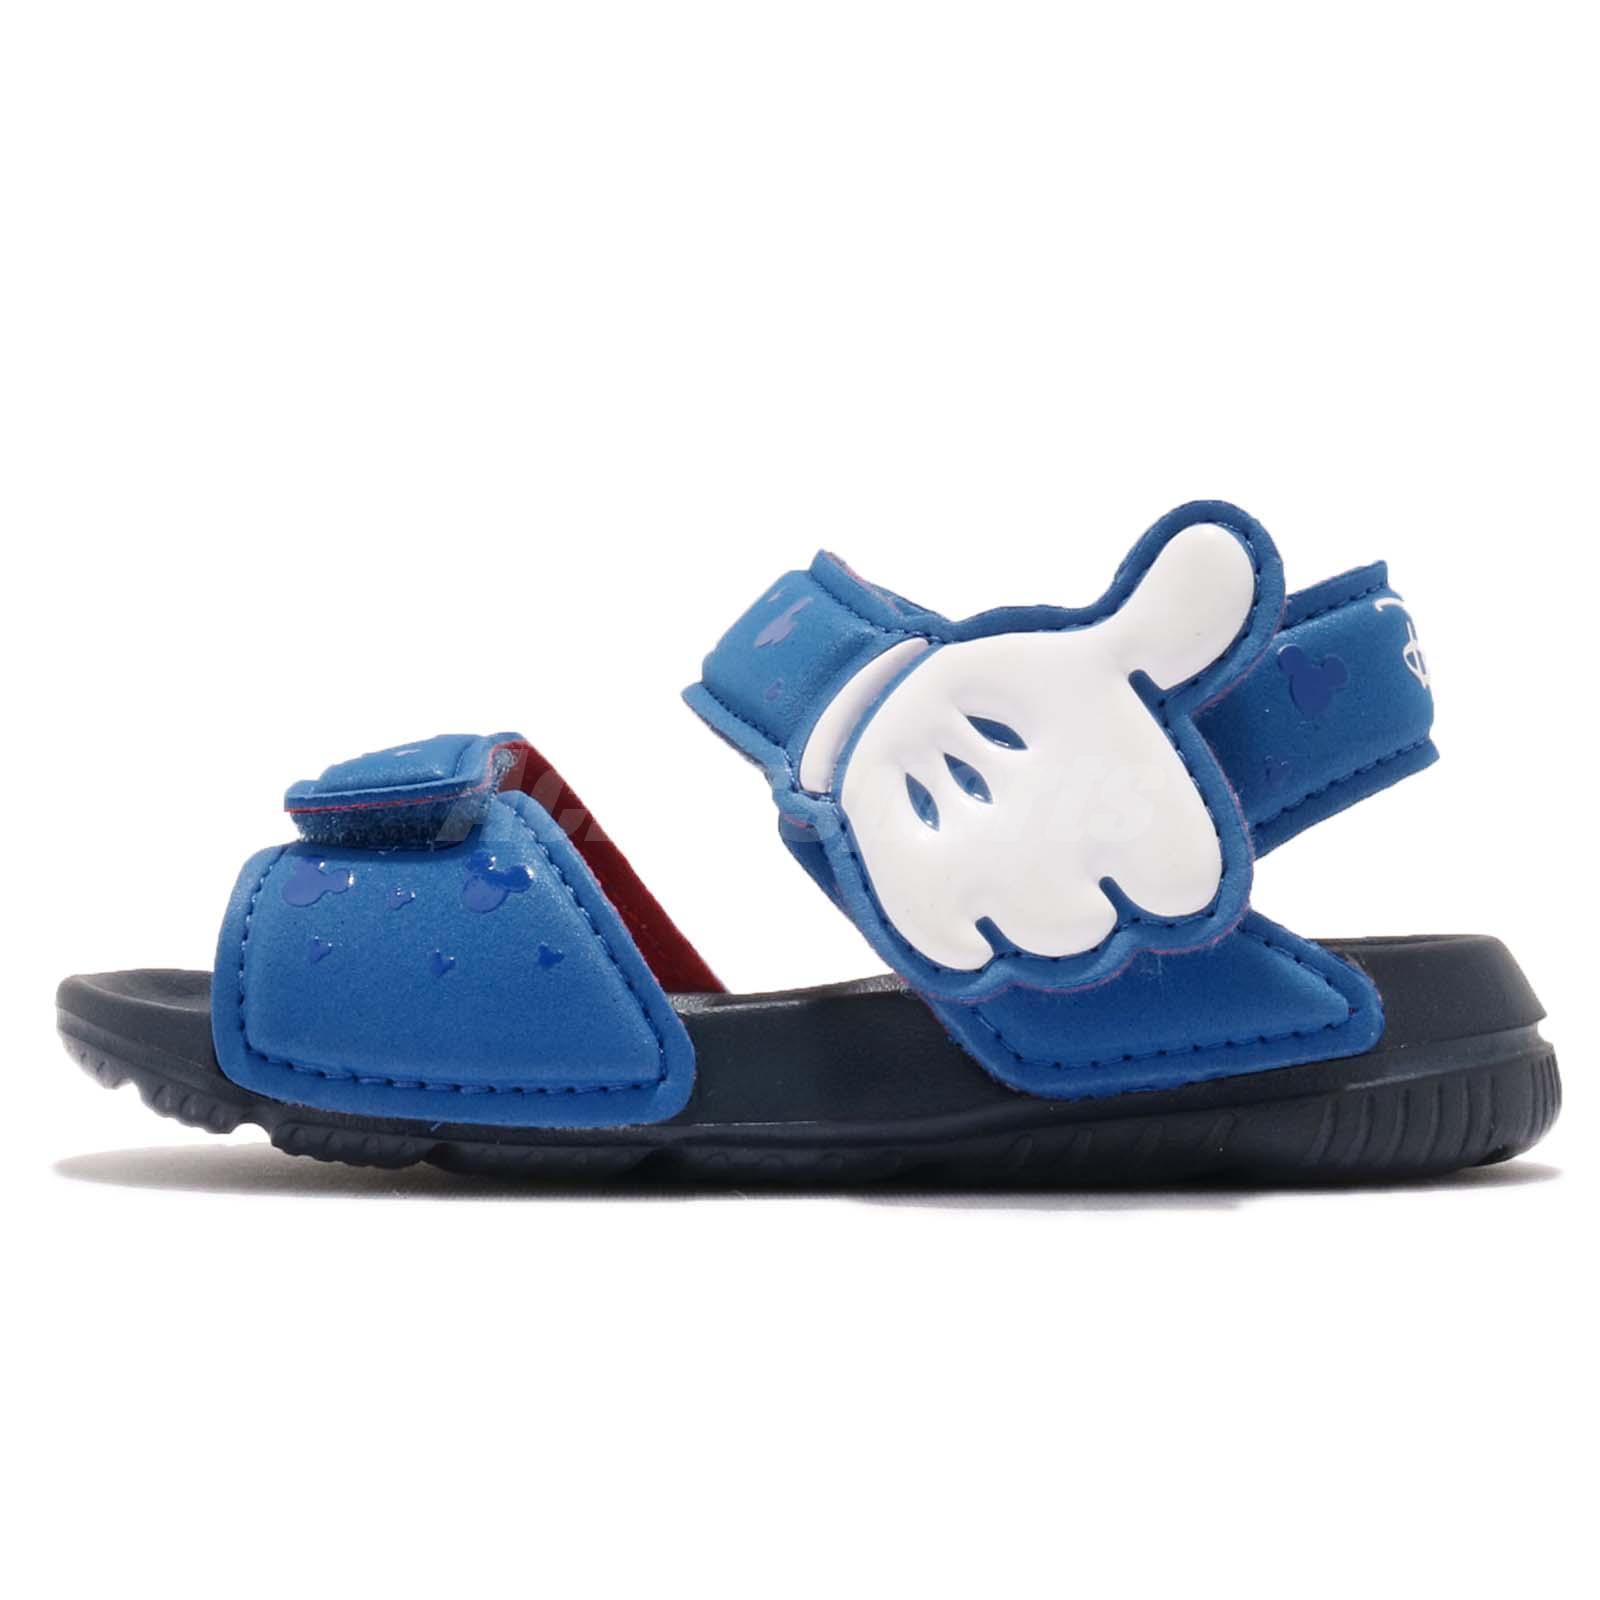 buy online 6c223 55913 adidas DY M M AltaSwim I Disney Micky Mouse Blue Infant Toddler Sandal  CQ0107